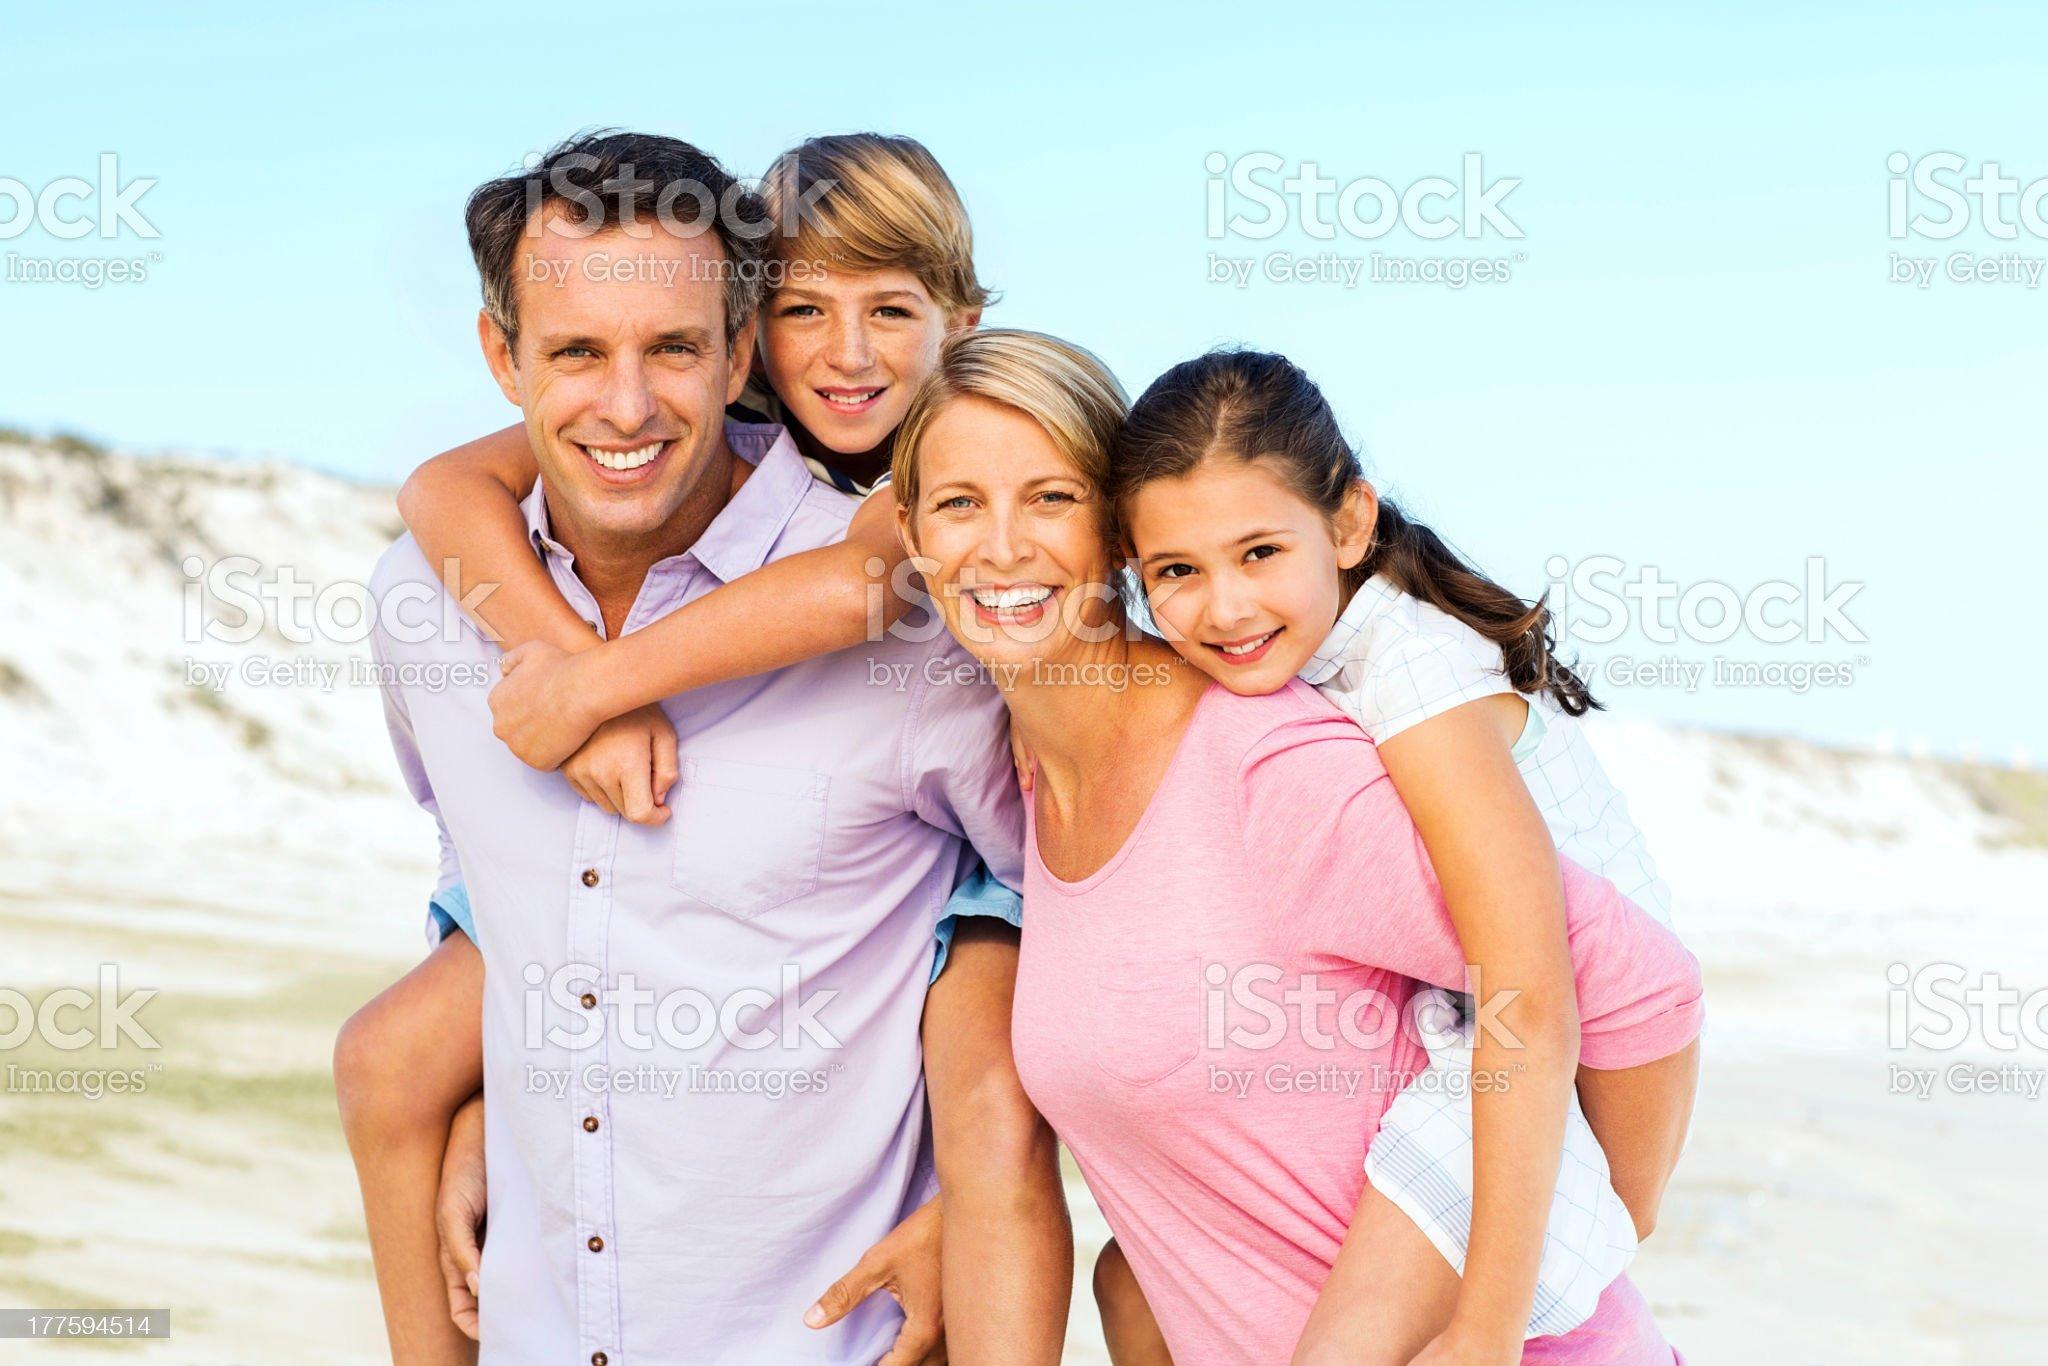 Parents Piggybacking Children At Beach royalty-free stock photo